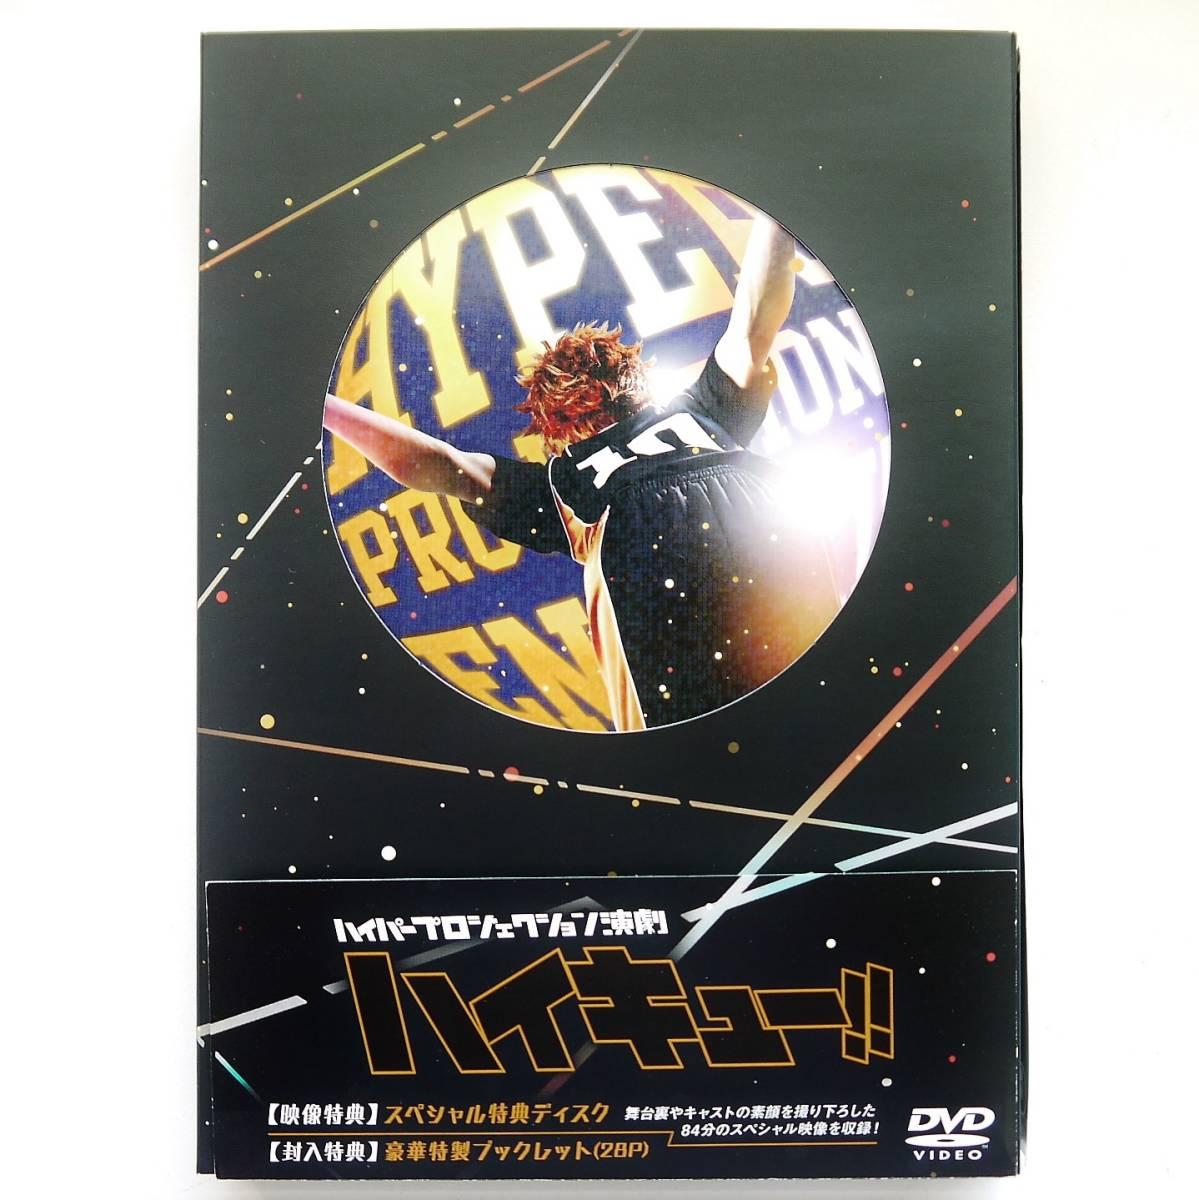 DVD 舞台 ハイパープロジェクション演劇 ハイキュー!!